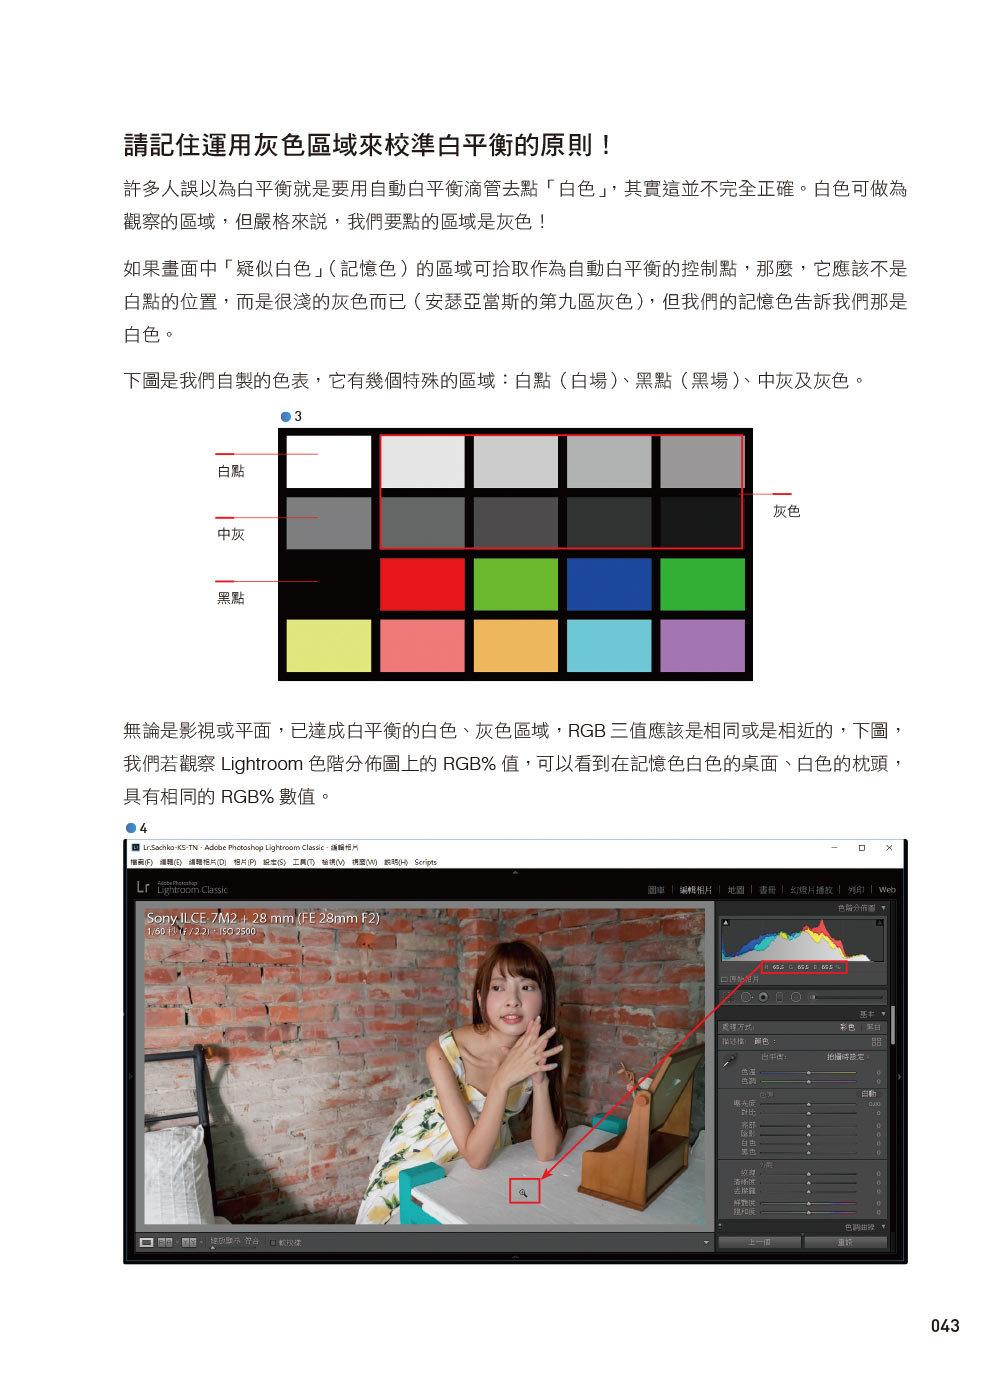 Lightroom Classic 魅力人像修圖經典版|調光調色x美膚秘訣x日系風x韓式婚紗-preview-5